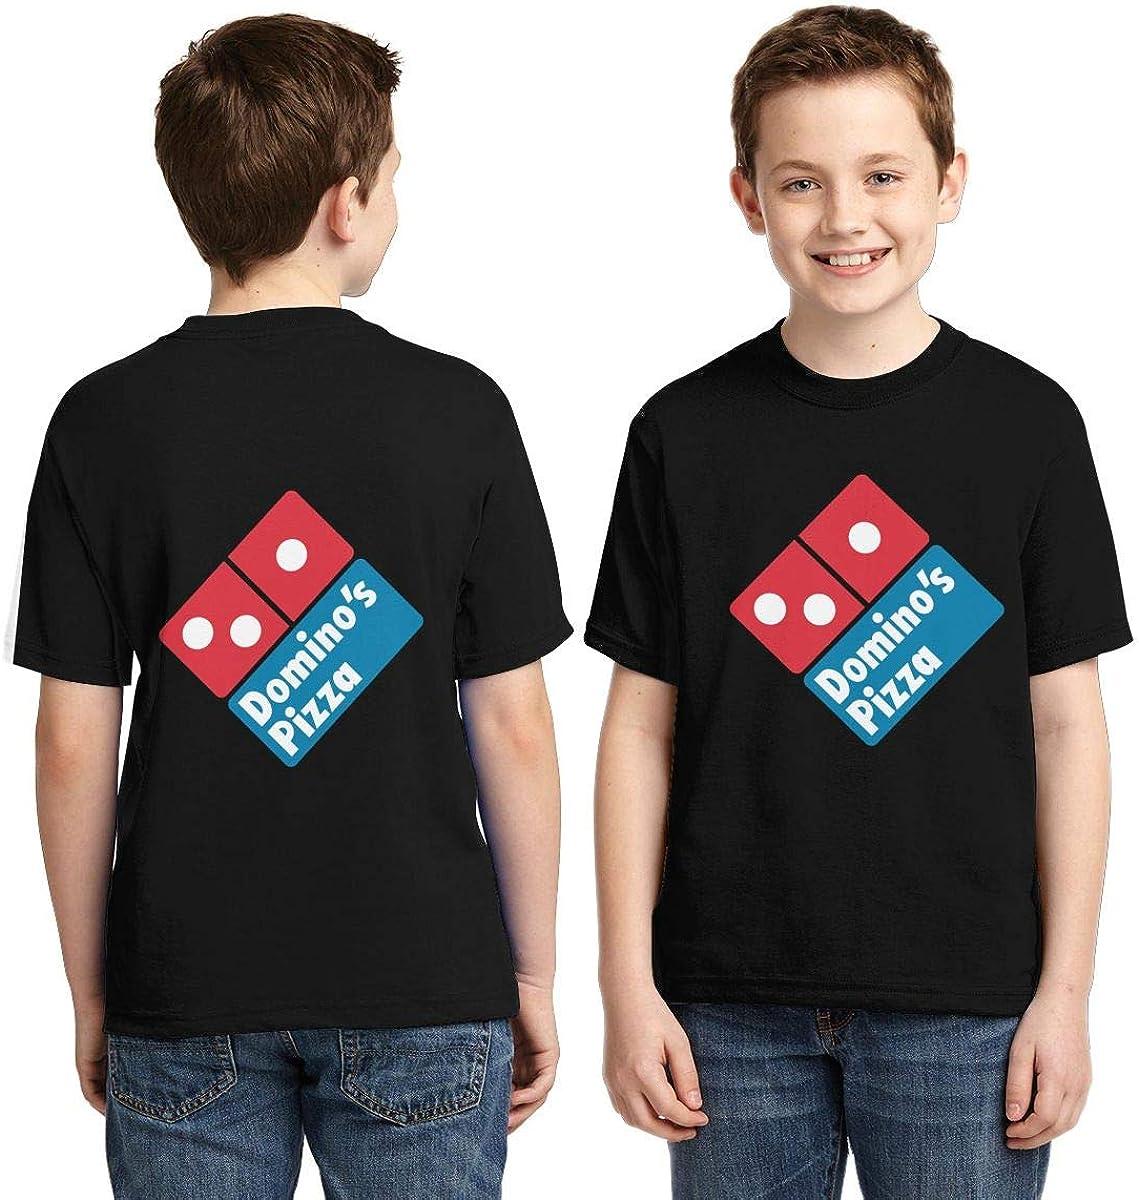 Yangyingb Boys,Girls,Youth Dominos Pizza T Shirts